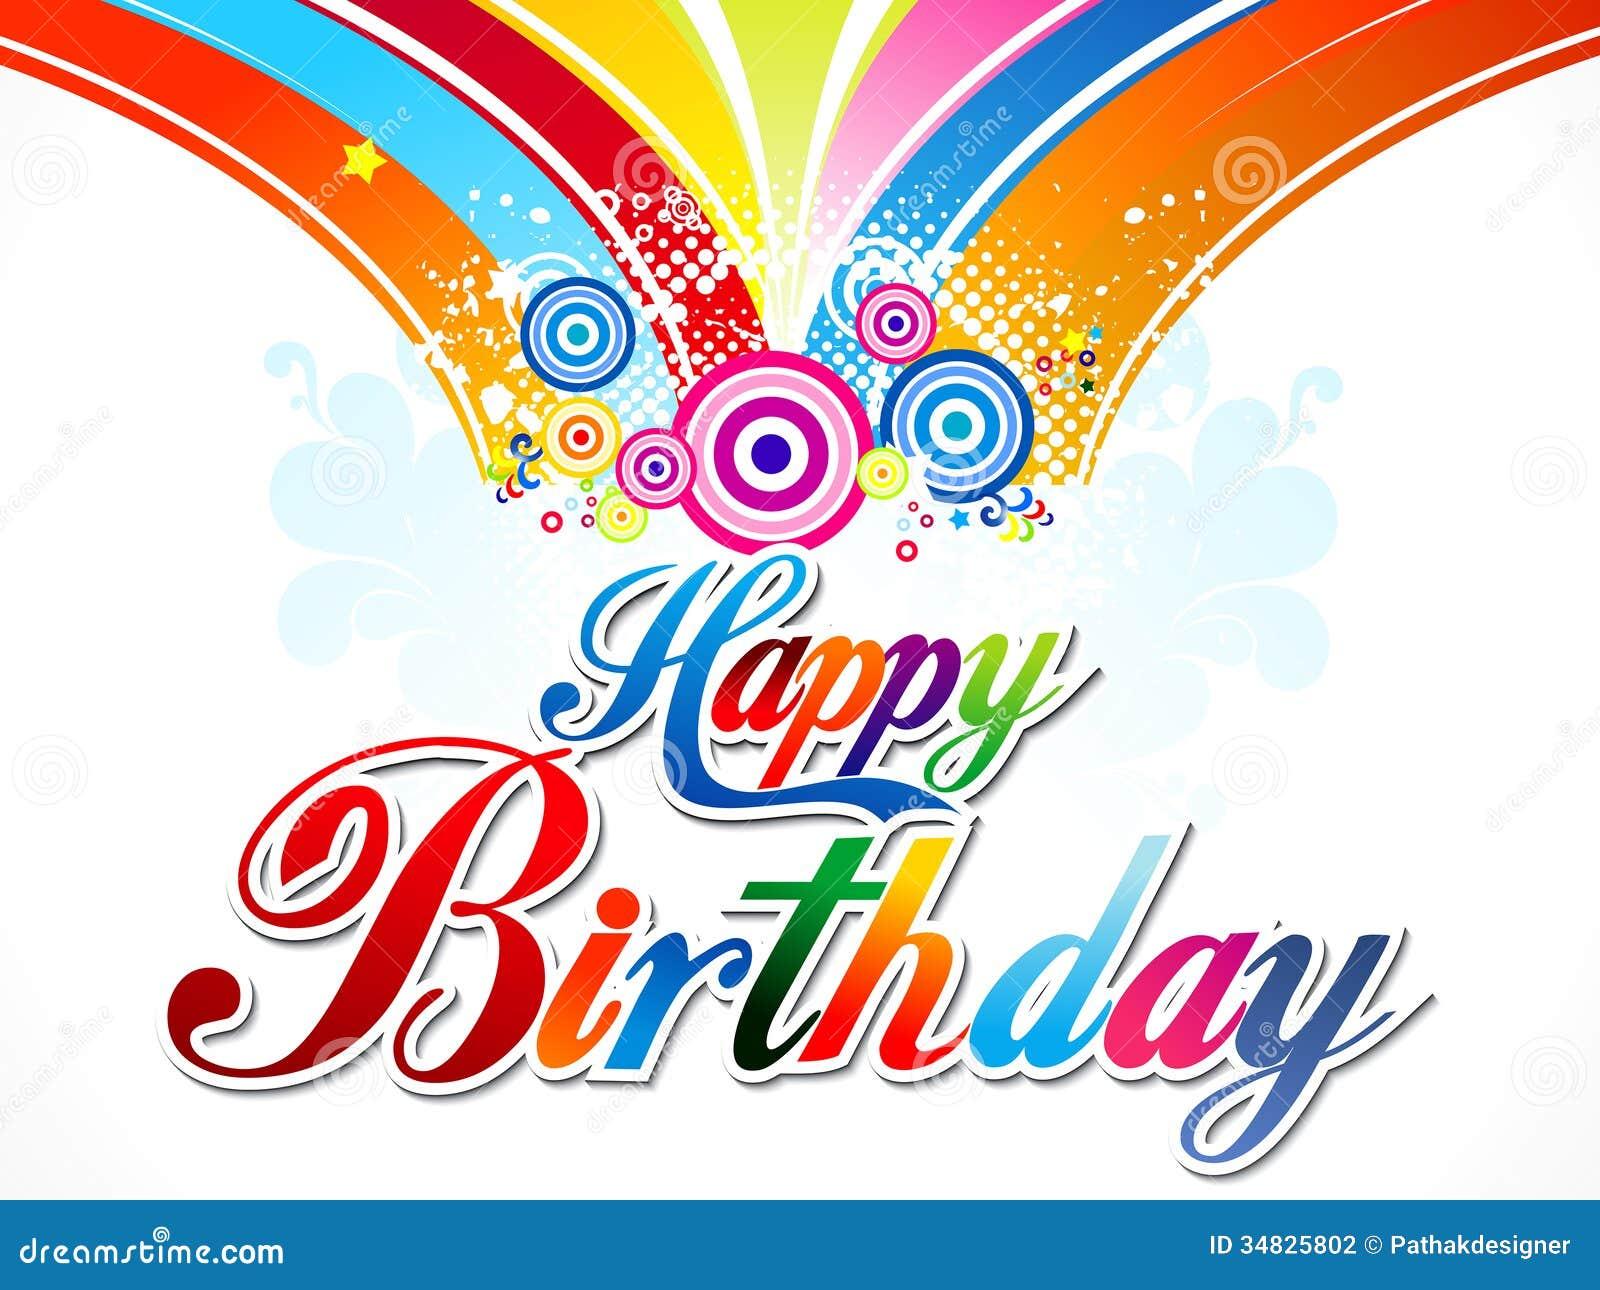 Abstract Happy Birthday Background Stock Photos - Image: 35914423